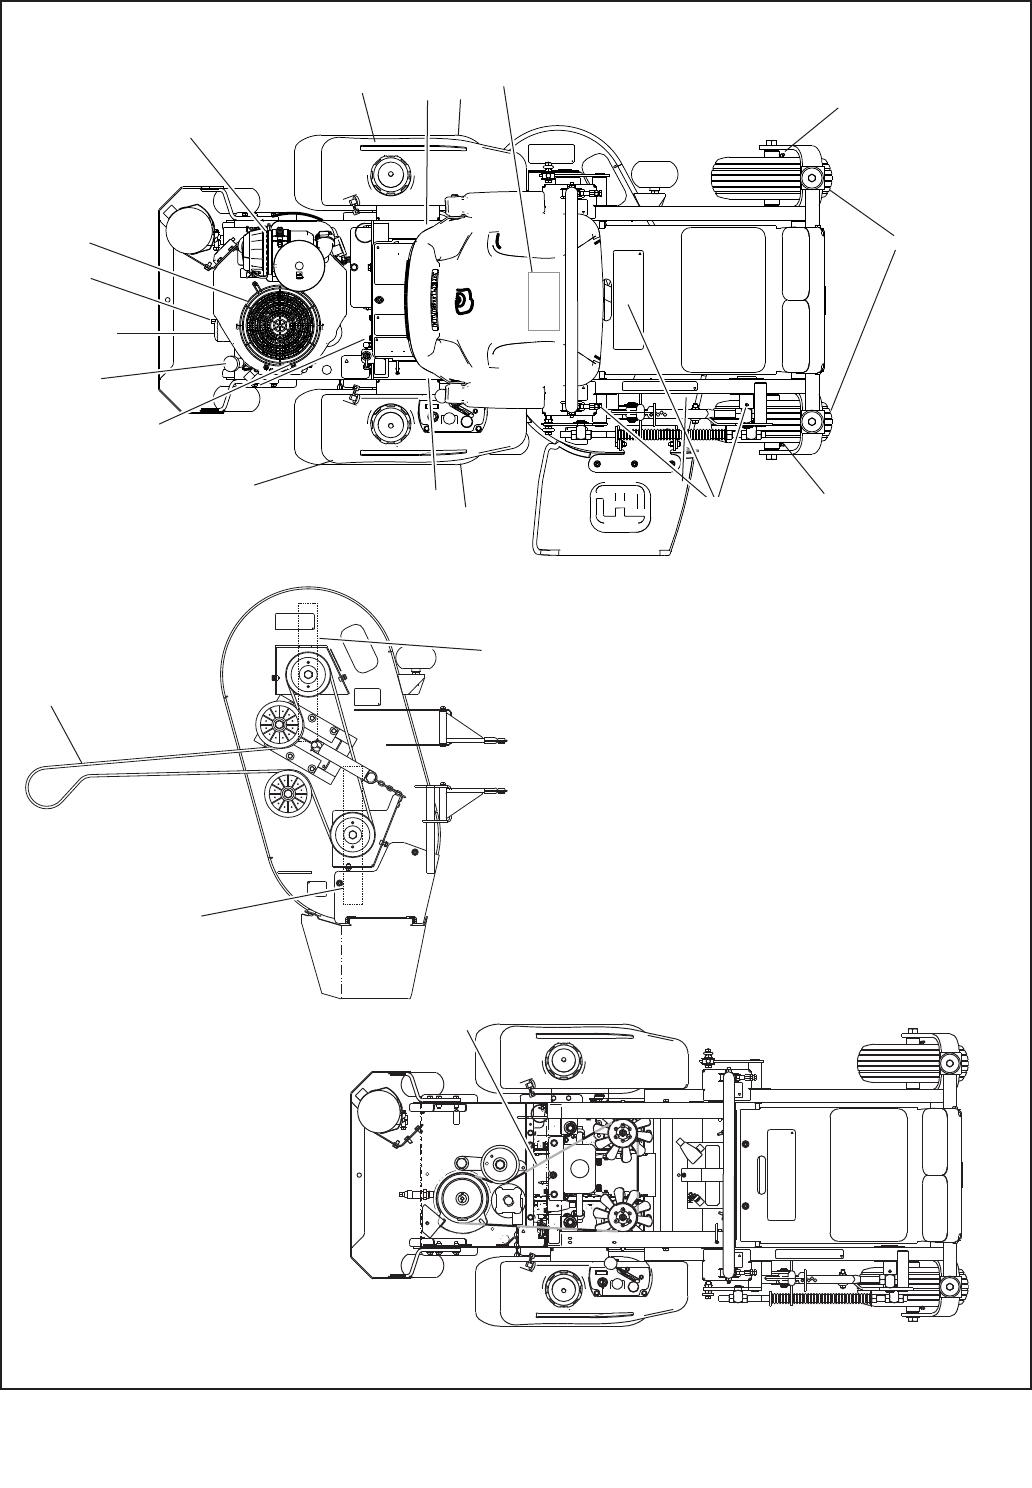 Hustler mini fast track parts breakdown